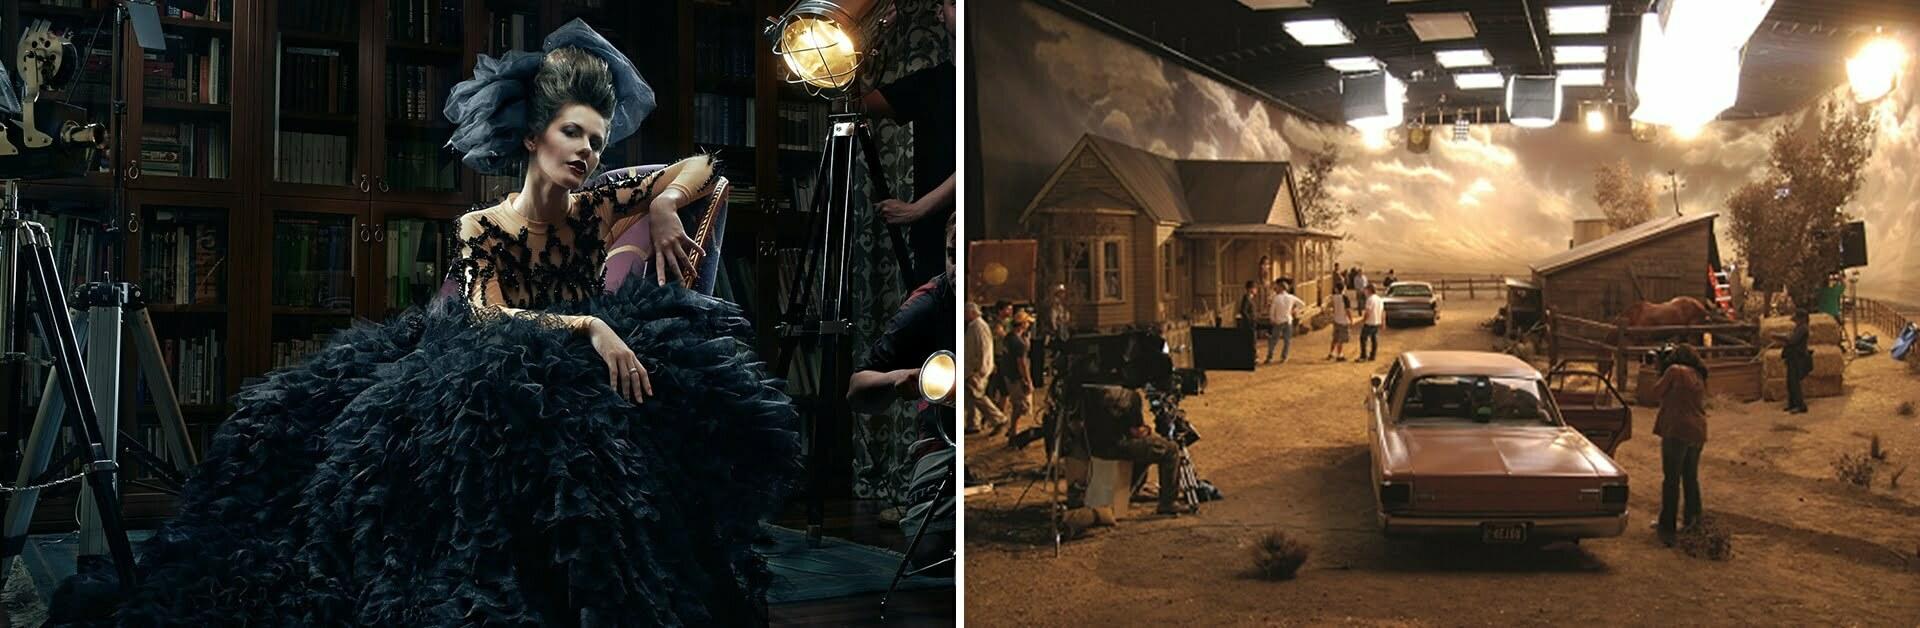 Film Shoot Stage Light